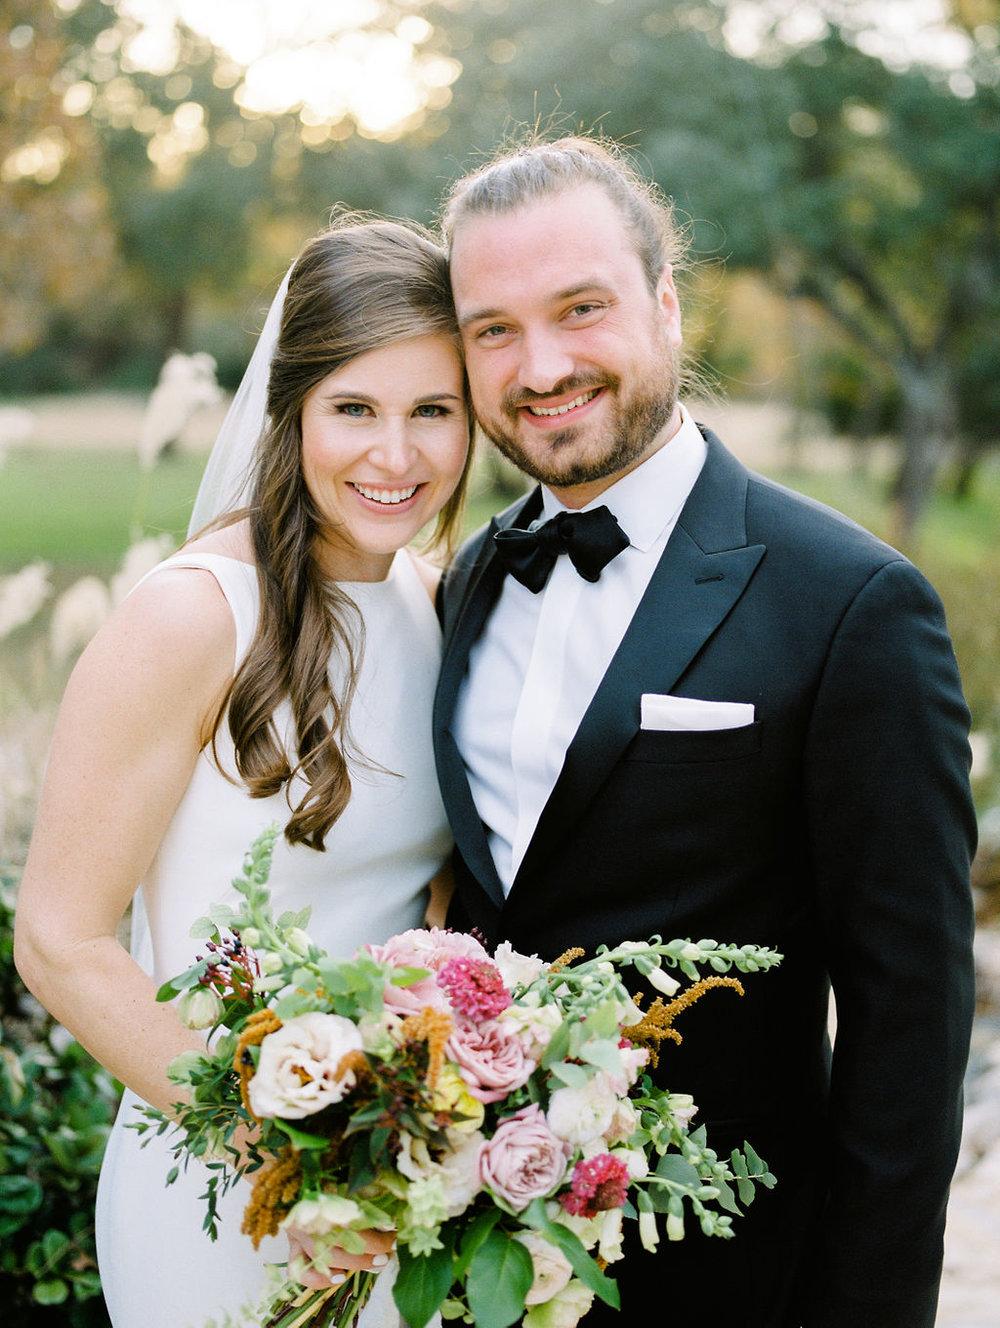 Austin-Texas-Wedding-Photographer-Addison-Grove-Film-113.jpg